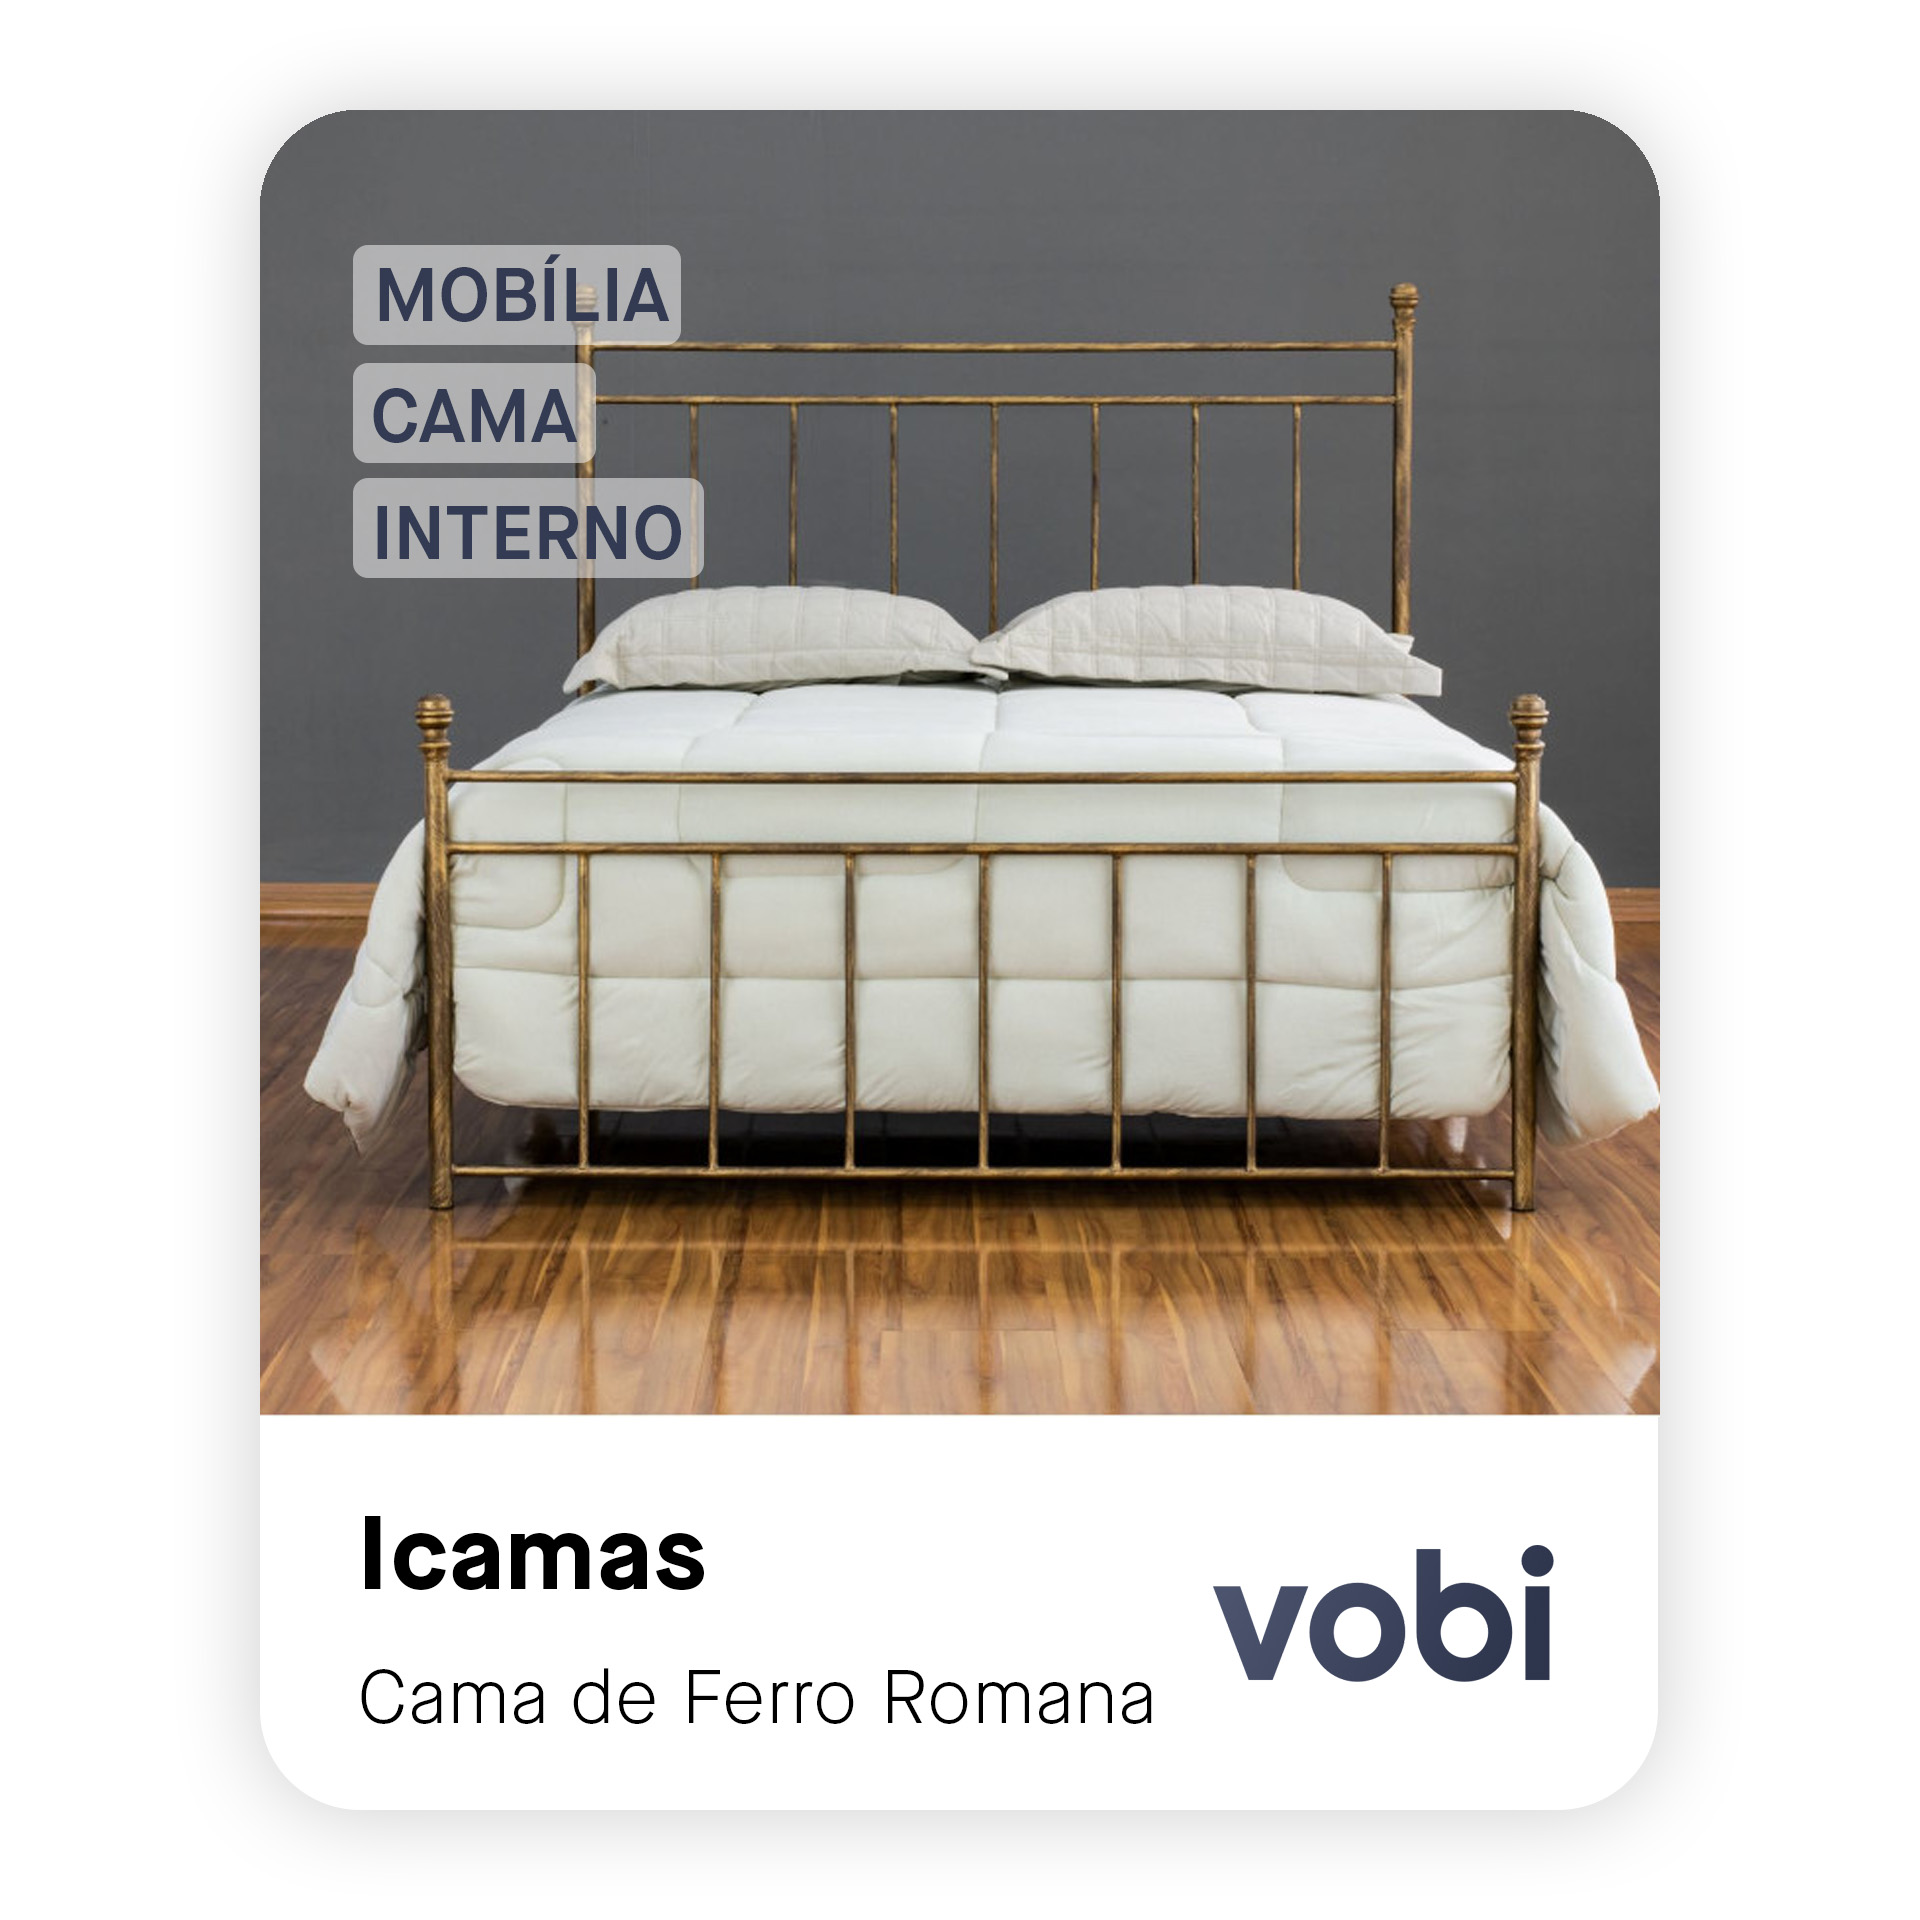 cama de ferro romana